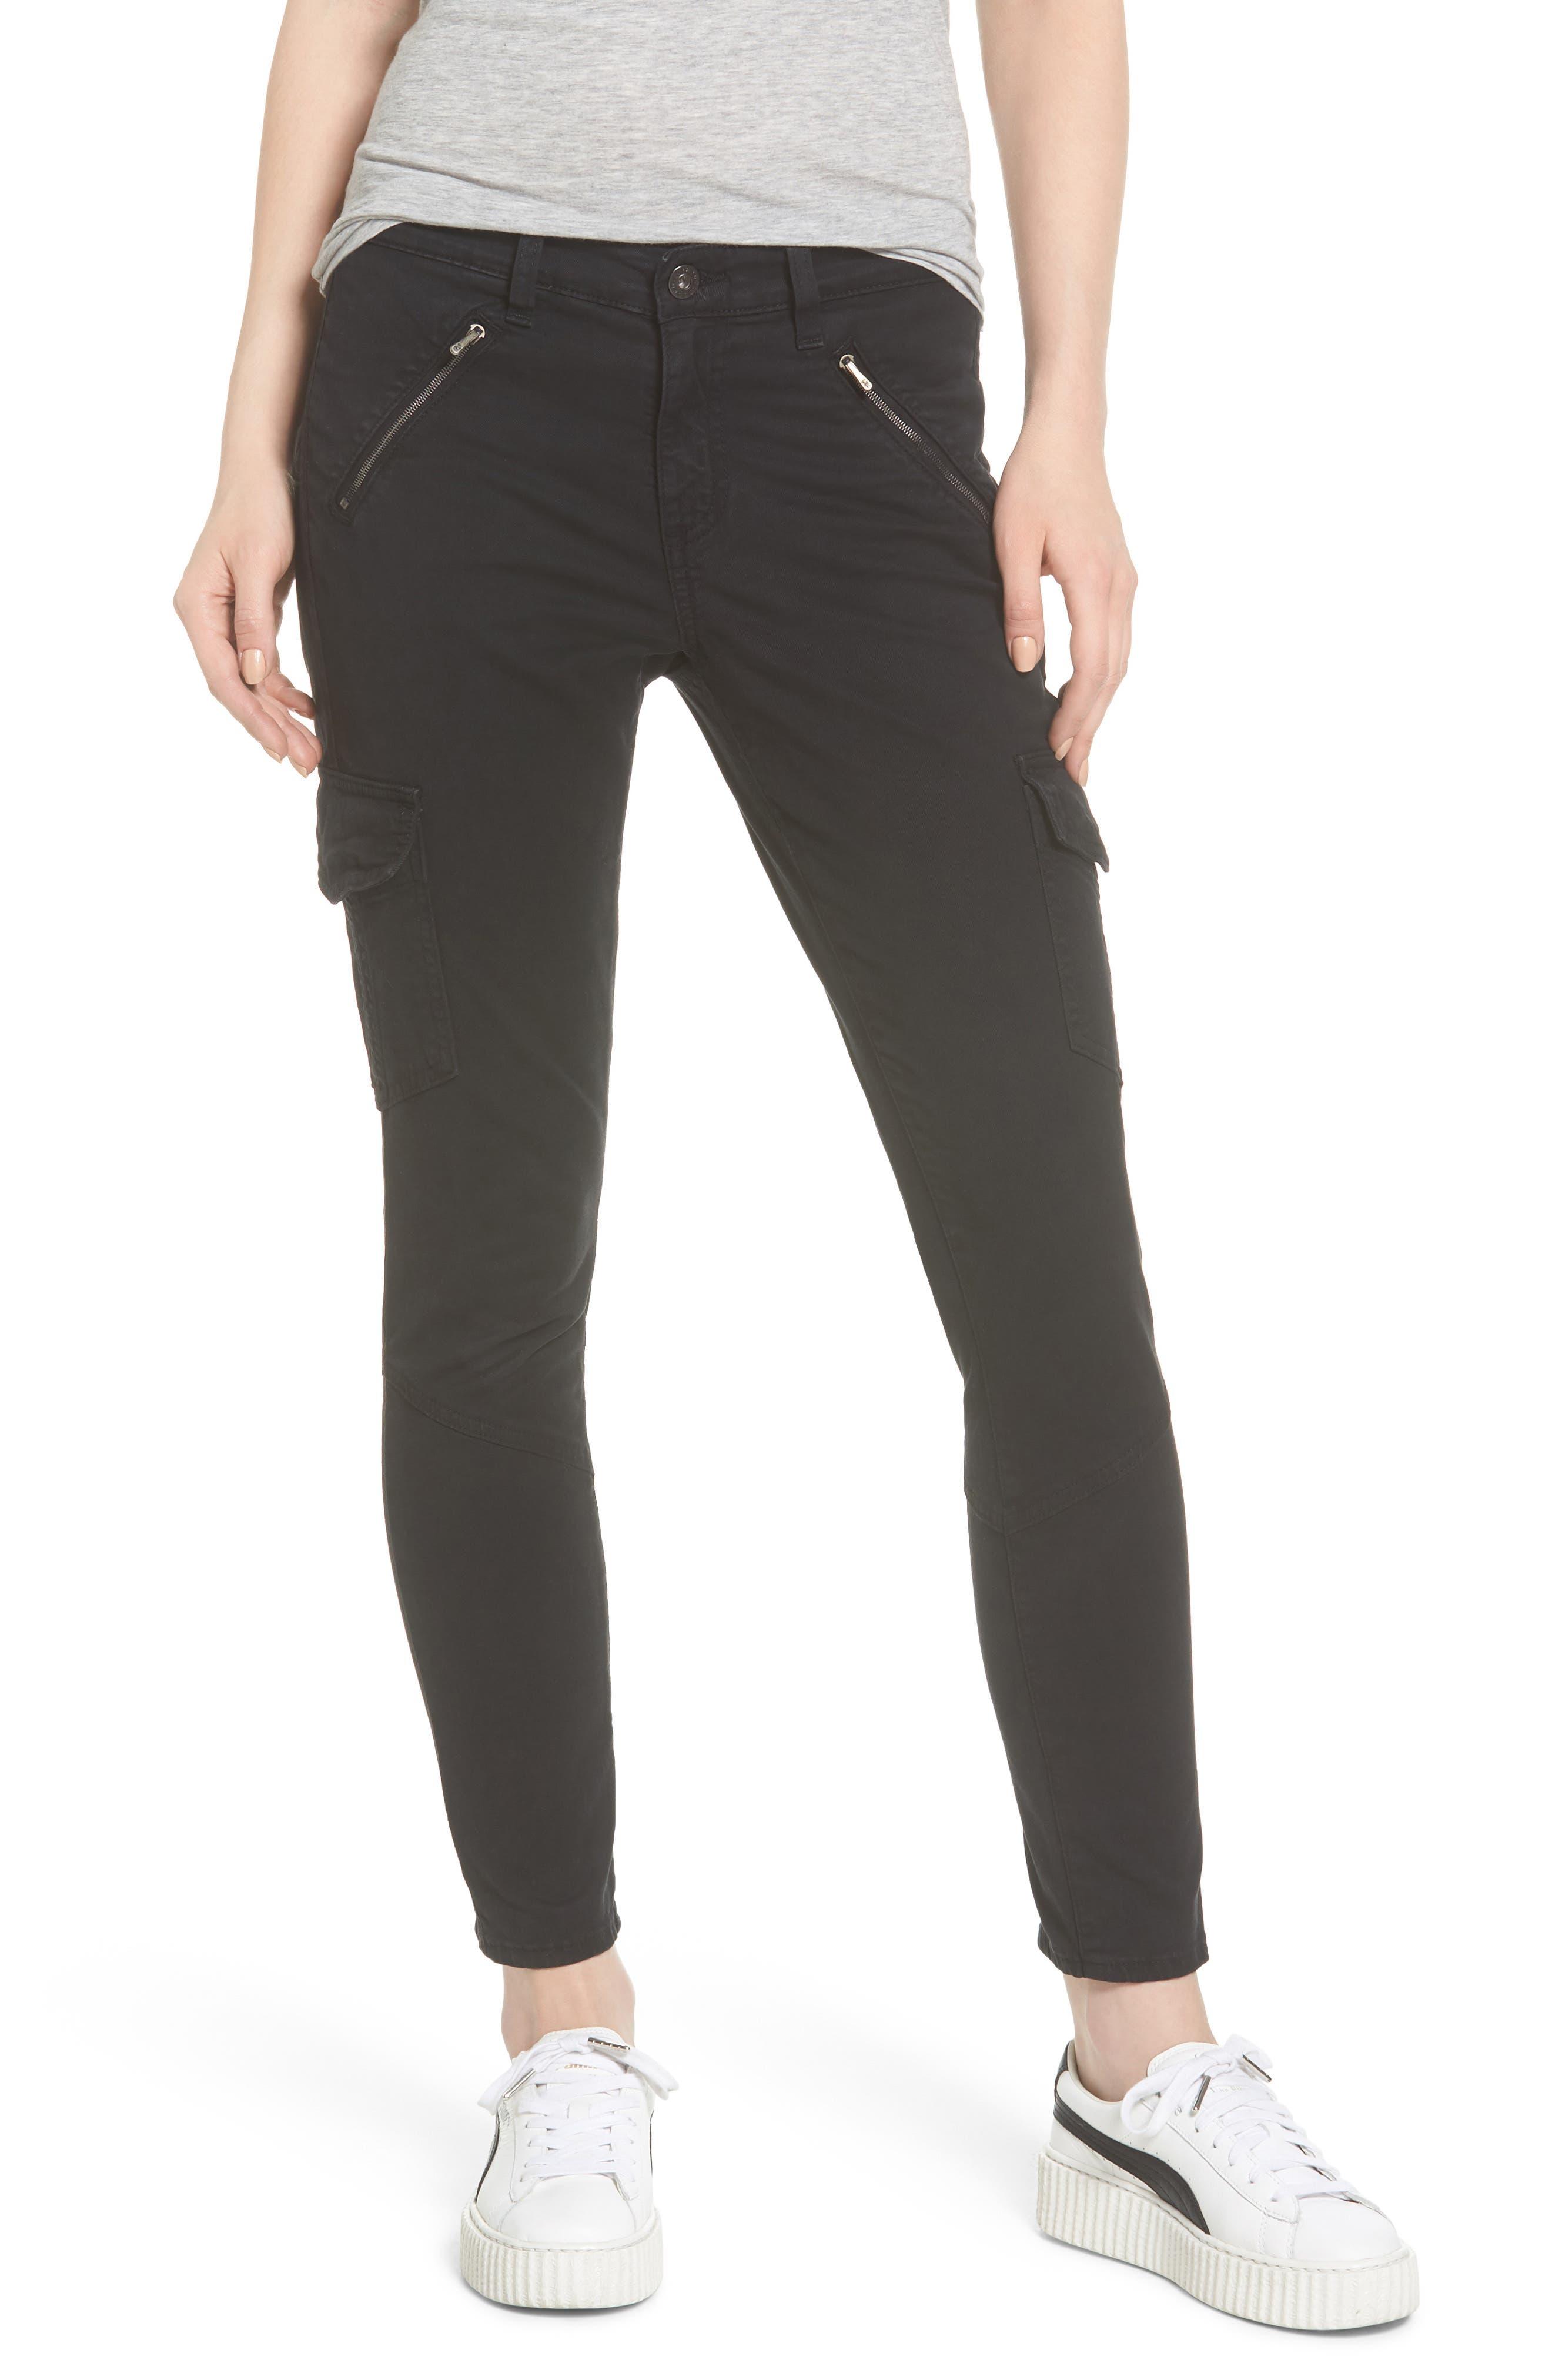 Whitt Ankle Skinny Cargo Pants,                         Main,                         color, 001